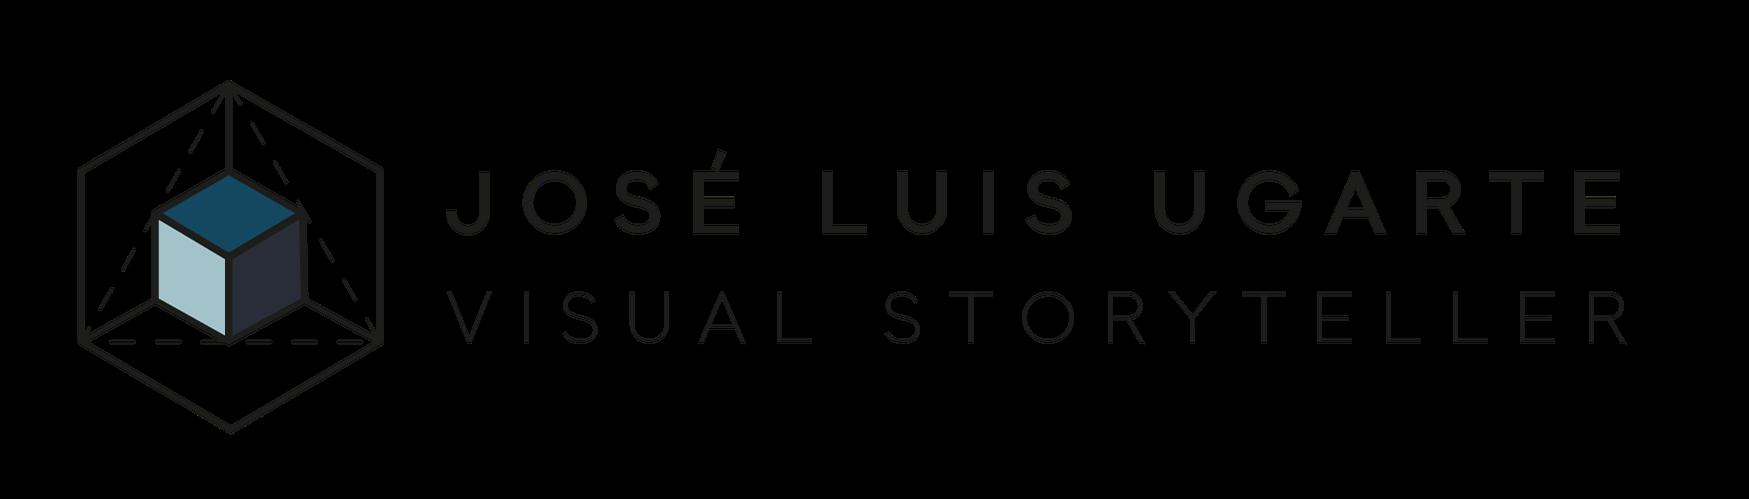 Jose Luis Ugarte